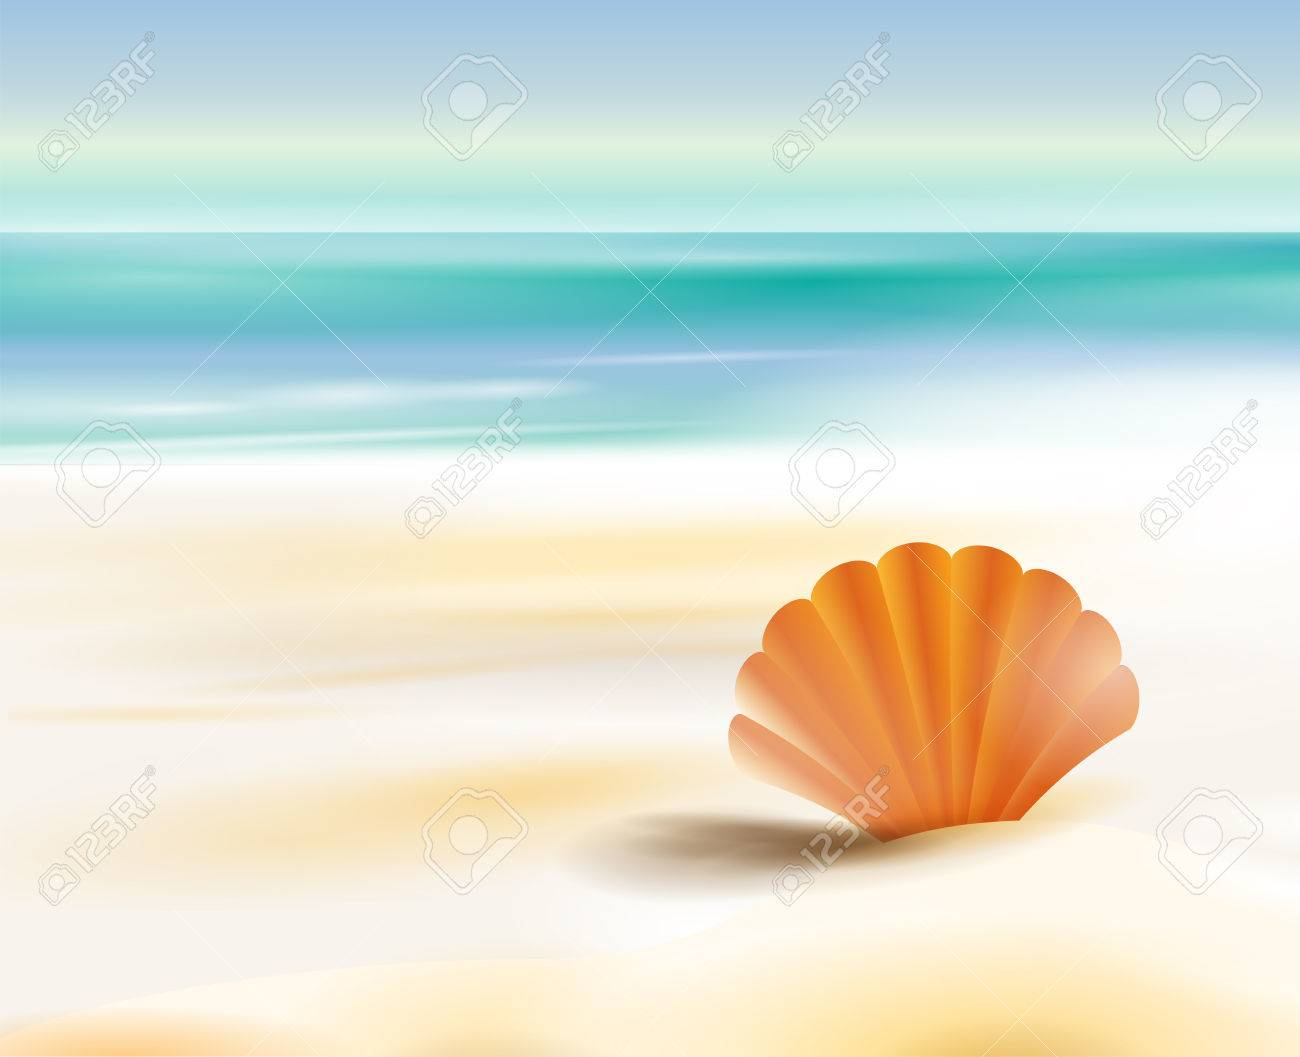 Sea cost возврат денег за капремонт пенсионерам